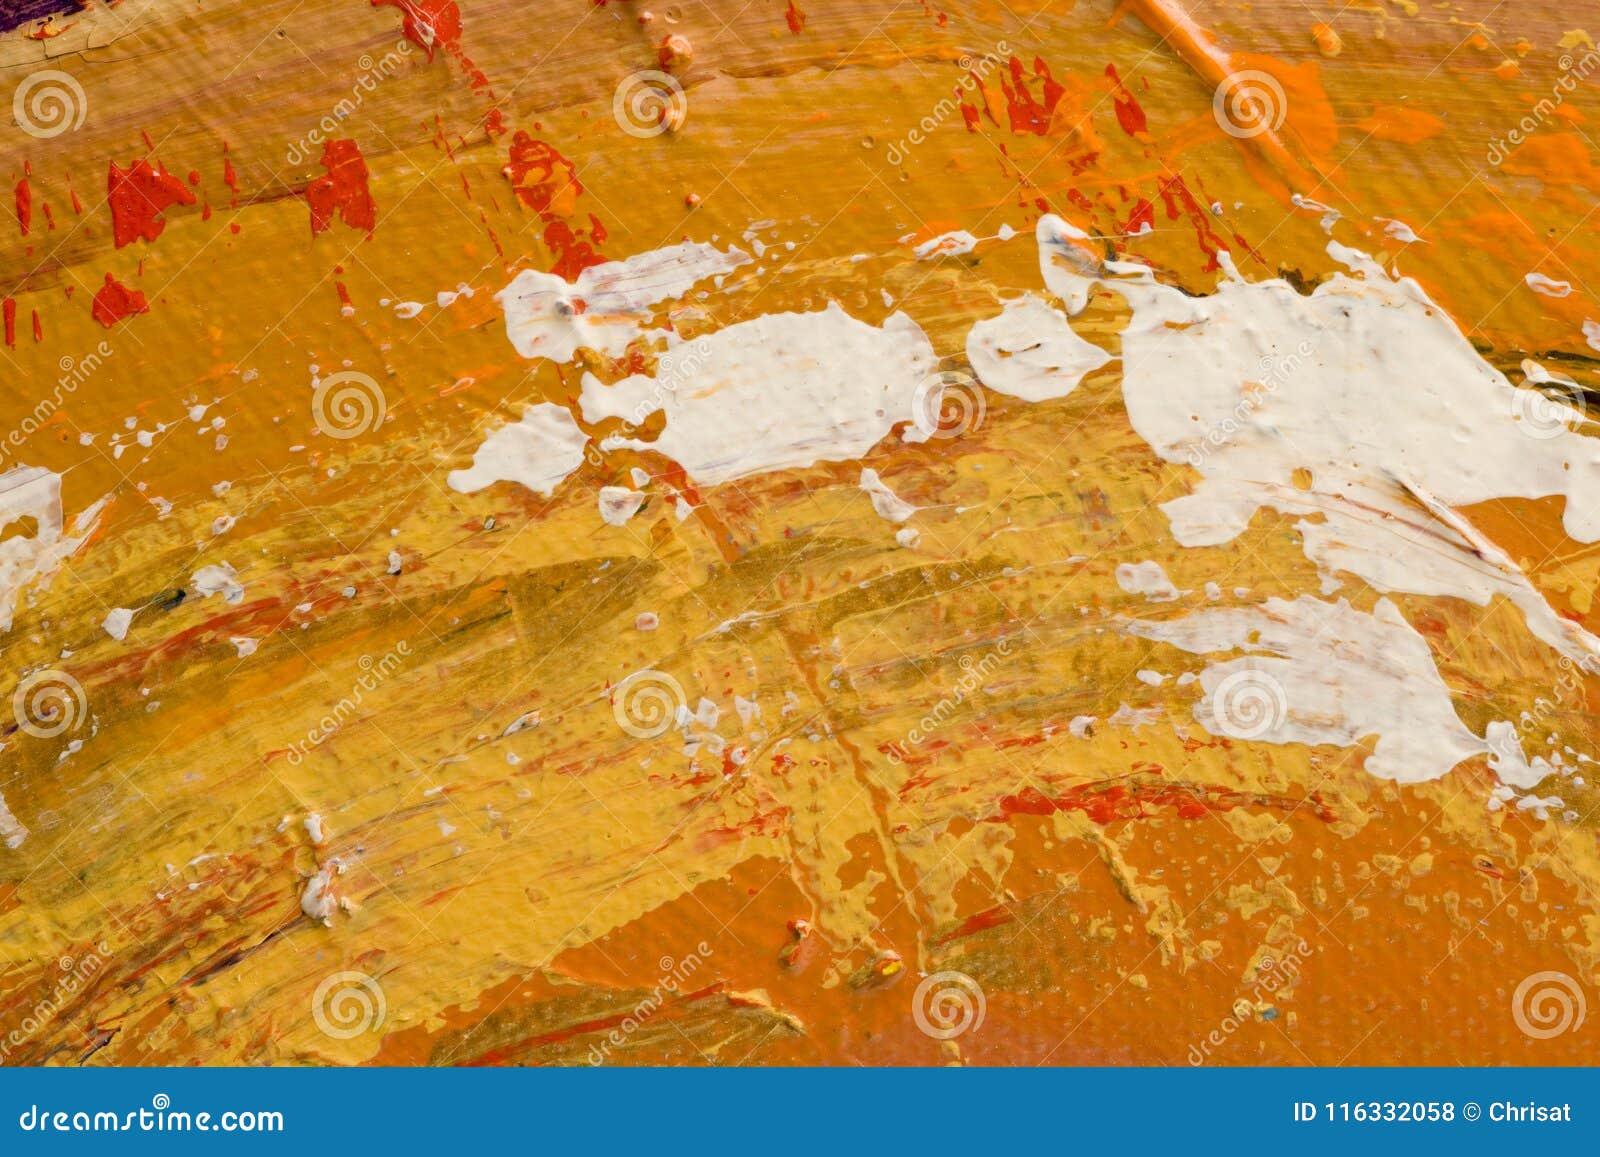 Art abstract